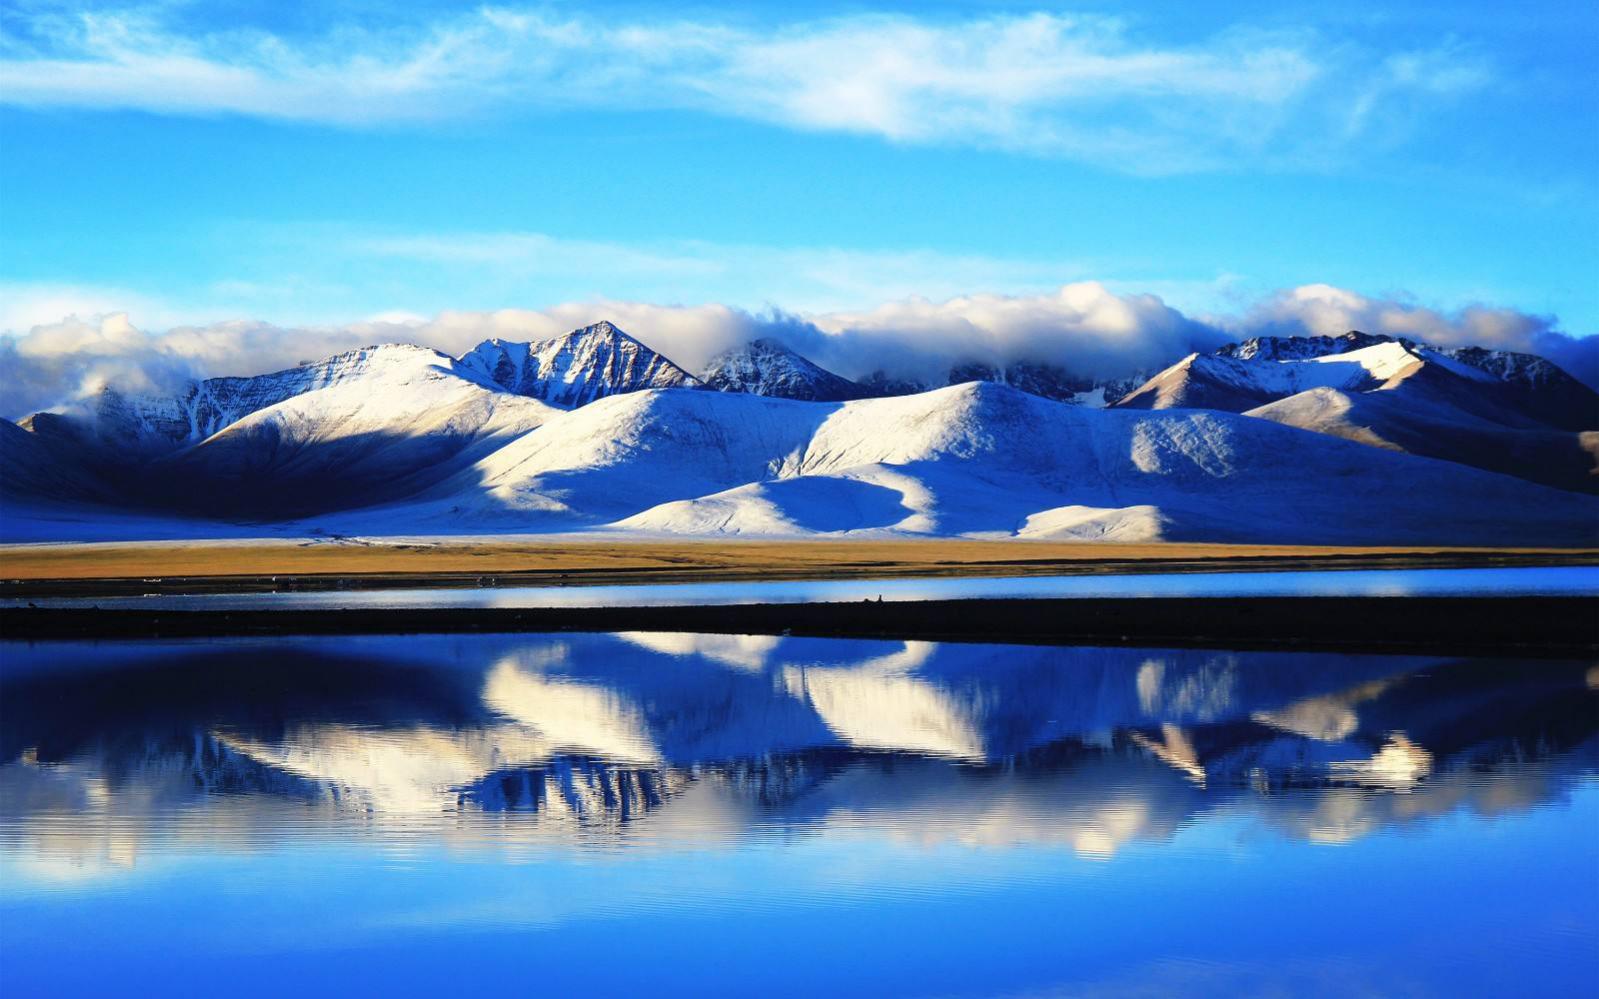 Namtso Lake: A place to whisper to God (Tibet) (Best season: July-September)